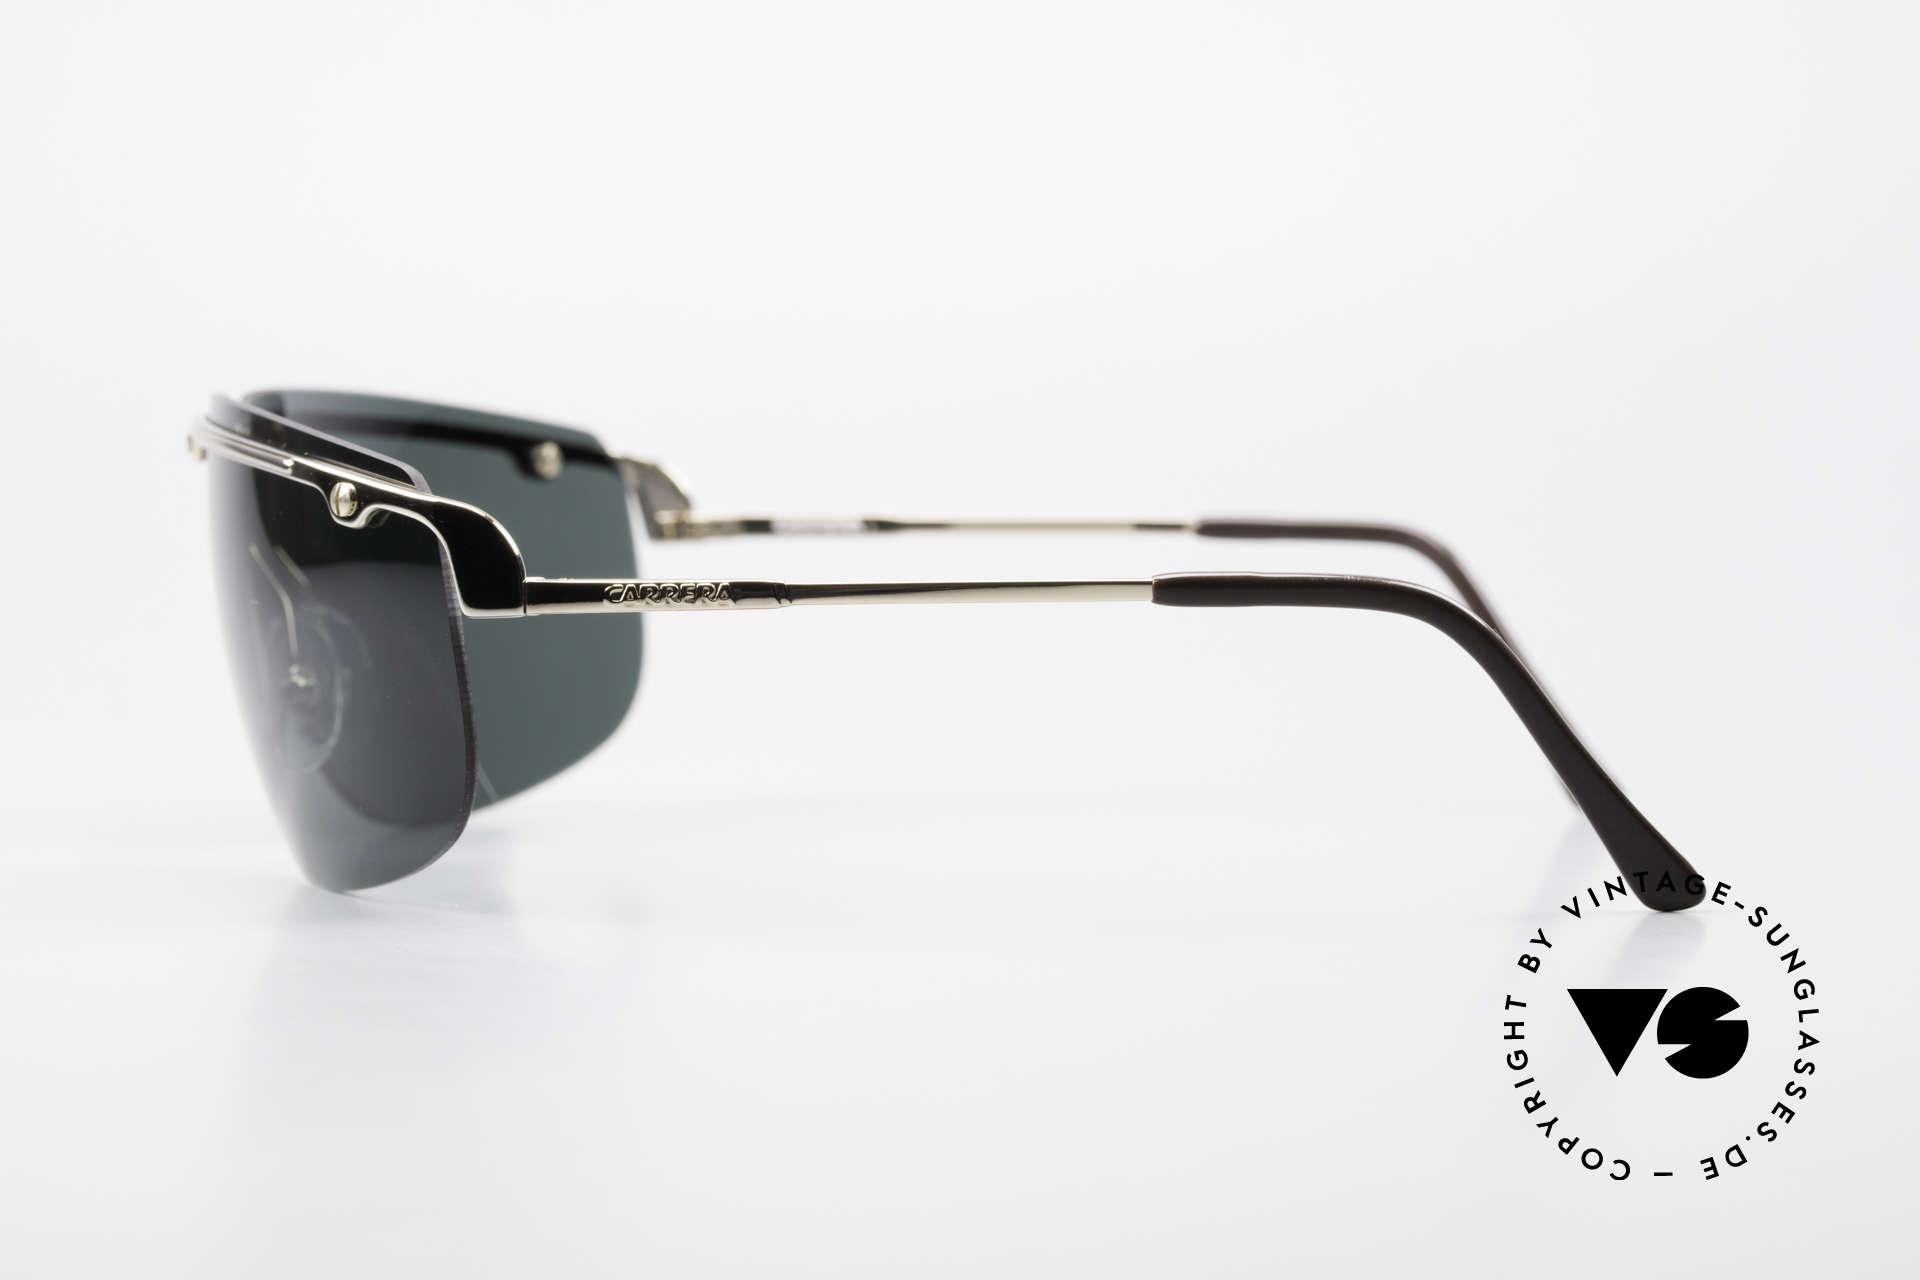 Carrera 5420 90's Wrap Sports Sunglasses, new old stock (like all our rare Carrera sunglasses), Made for Men